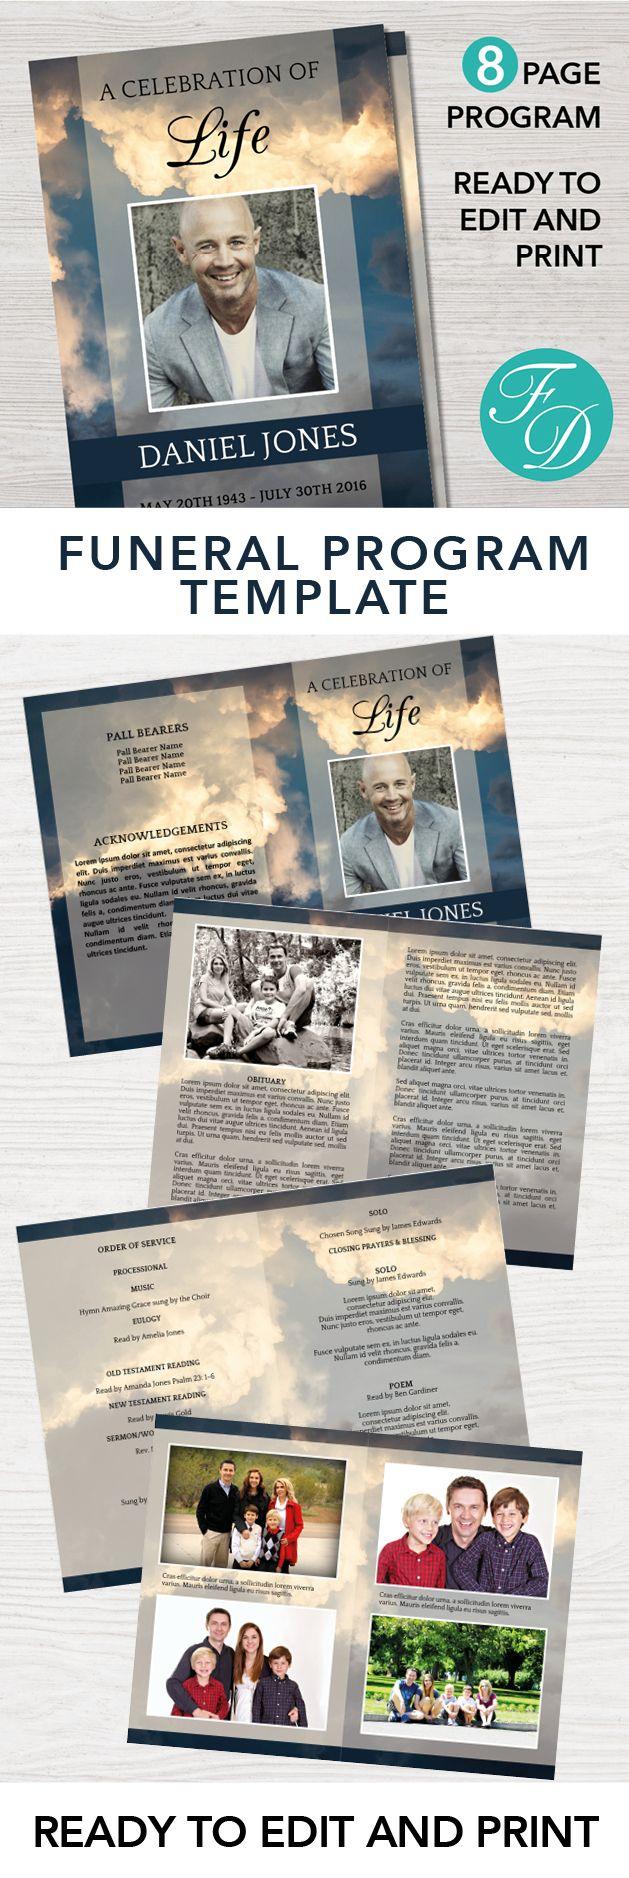 Funeral Program Template 8 Page Program Obituary Template